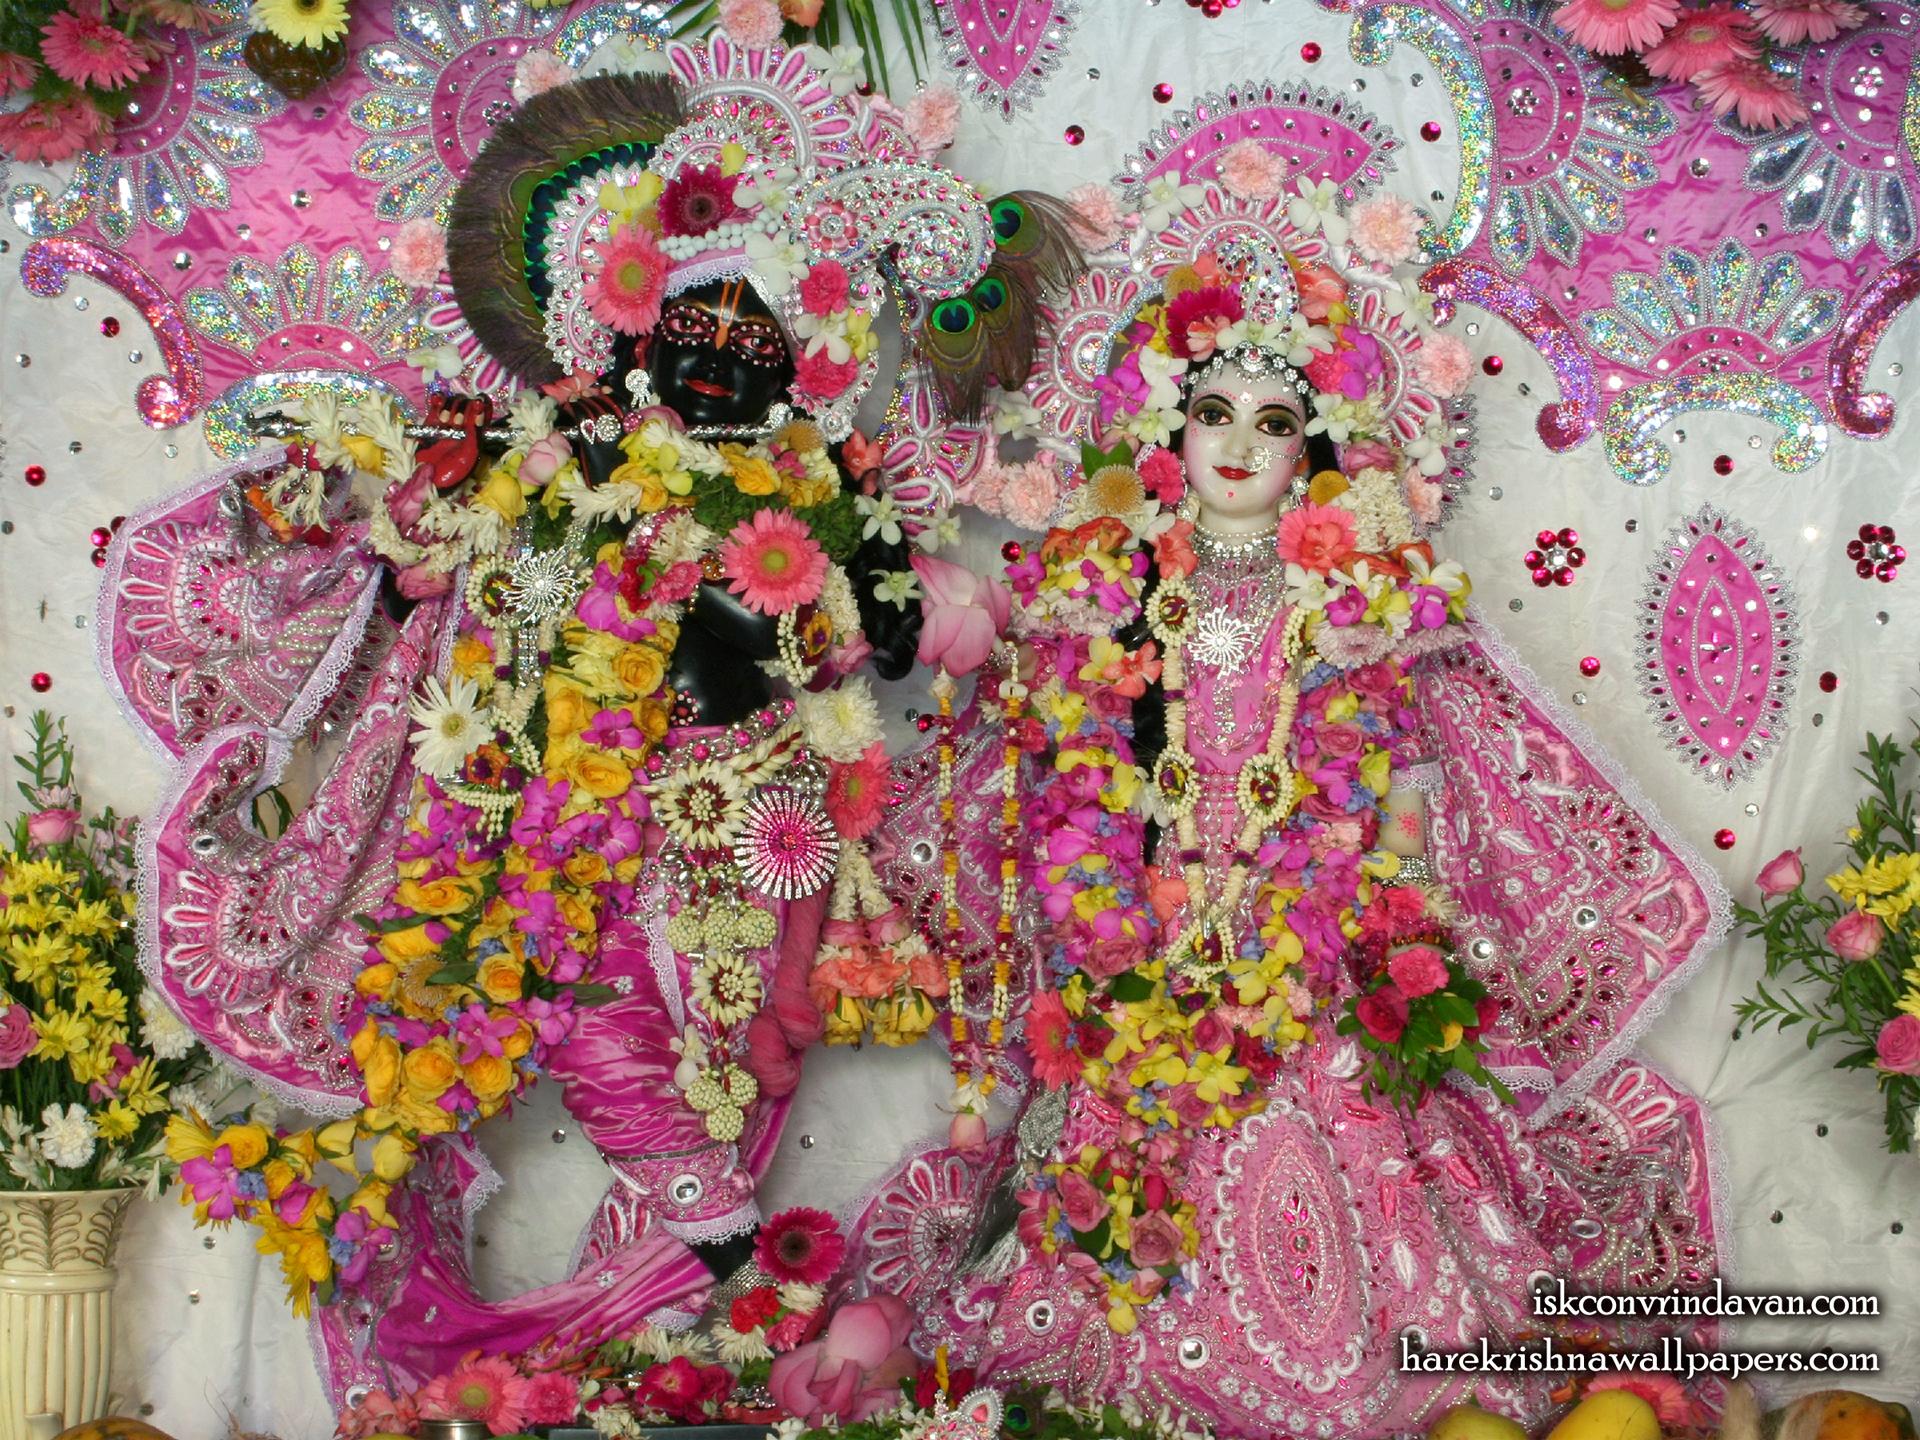 Sri Sri Radha Shyamsundar Wallpaper (015) Size 1920x1440 Download